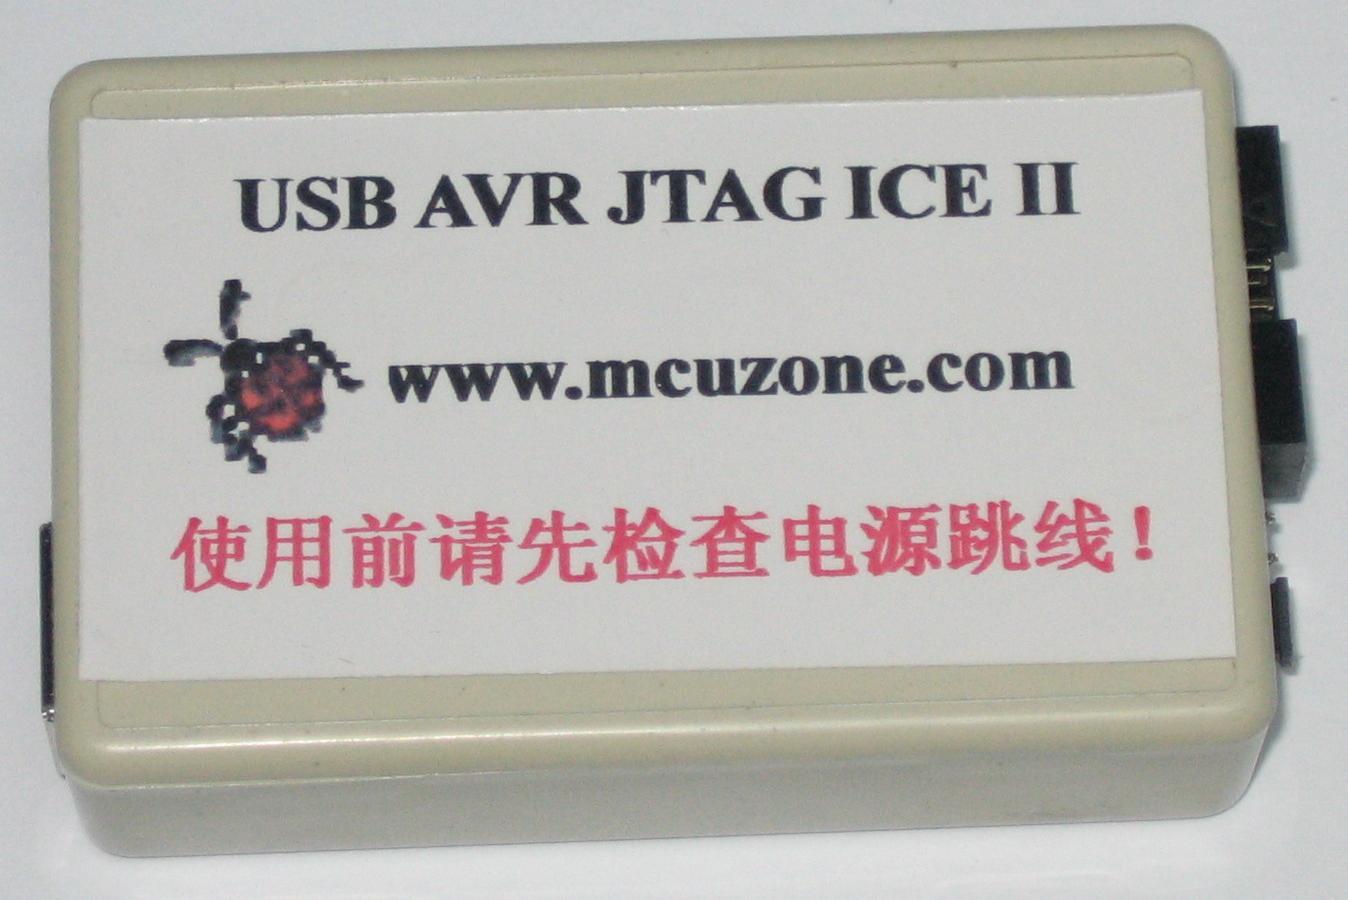 [分享]usb接口的avr jtag ice!支持avr studio 4.12